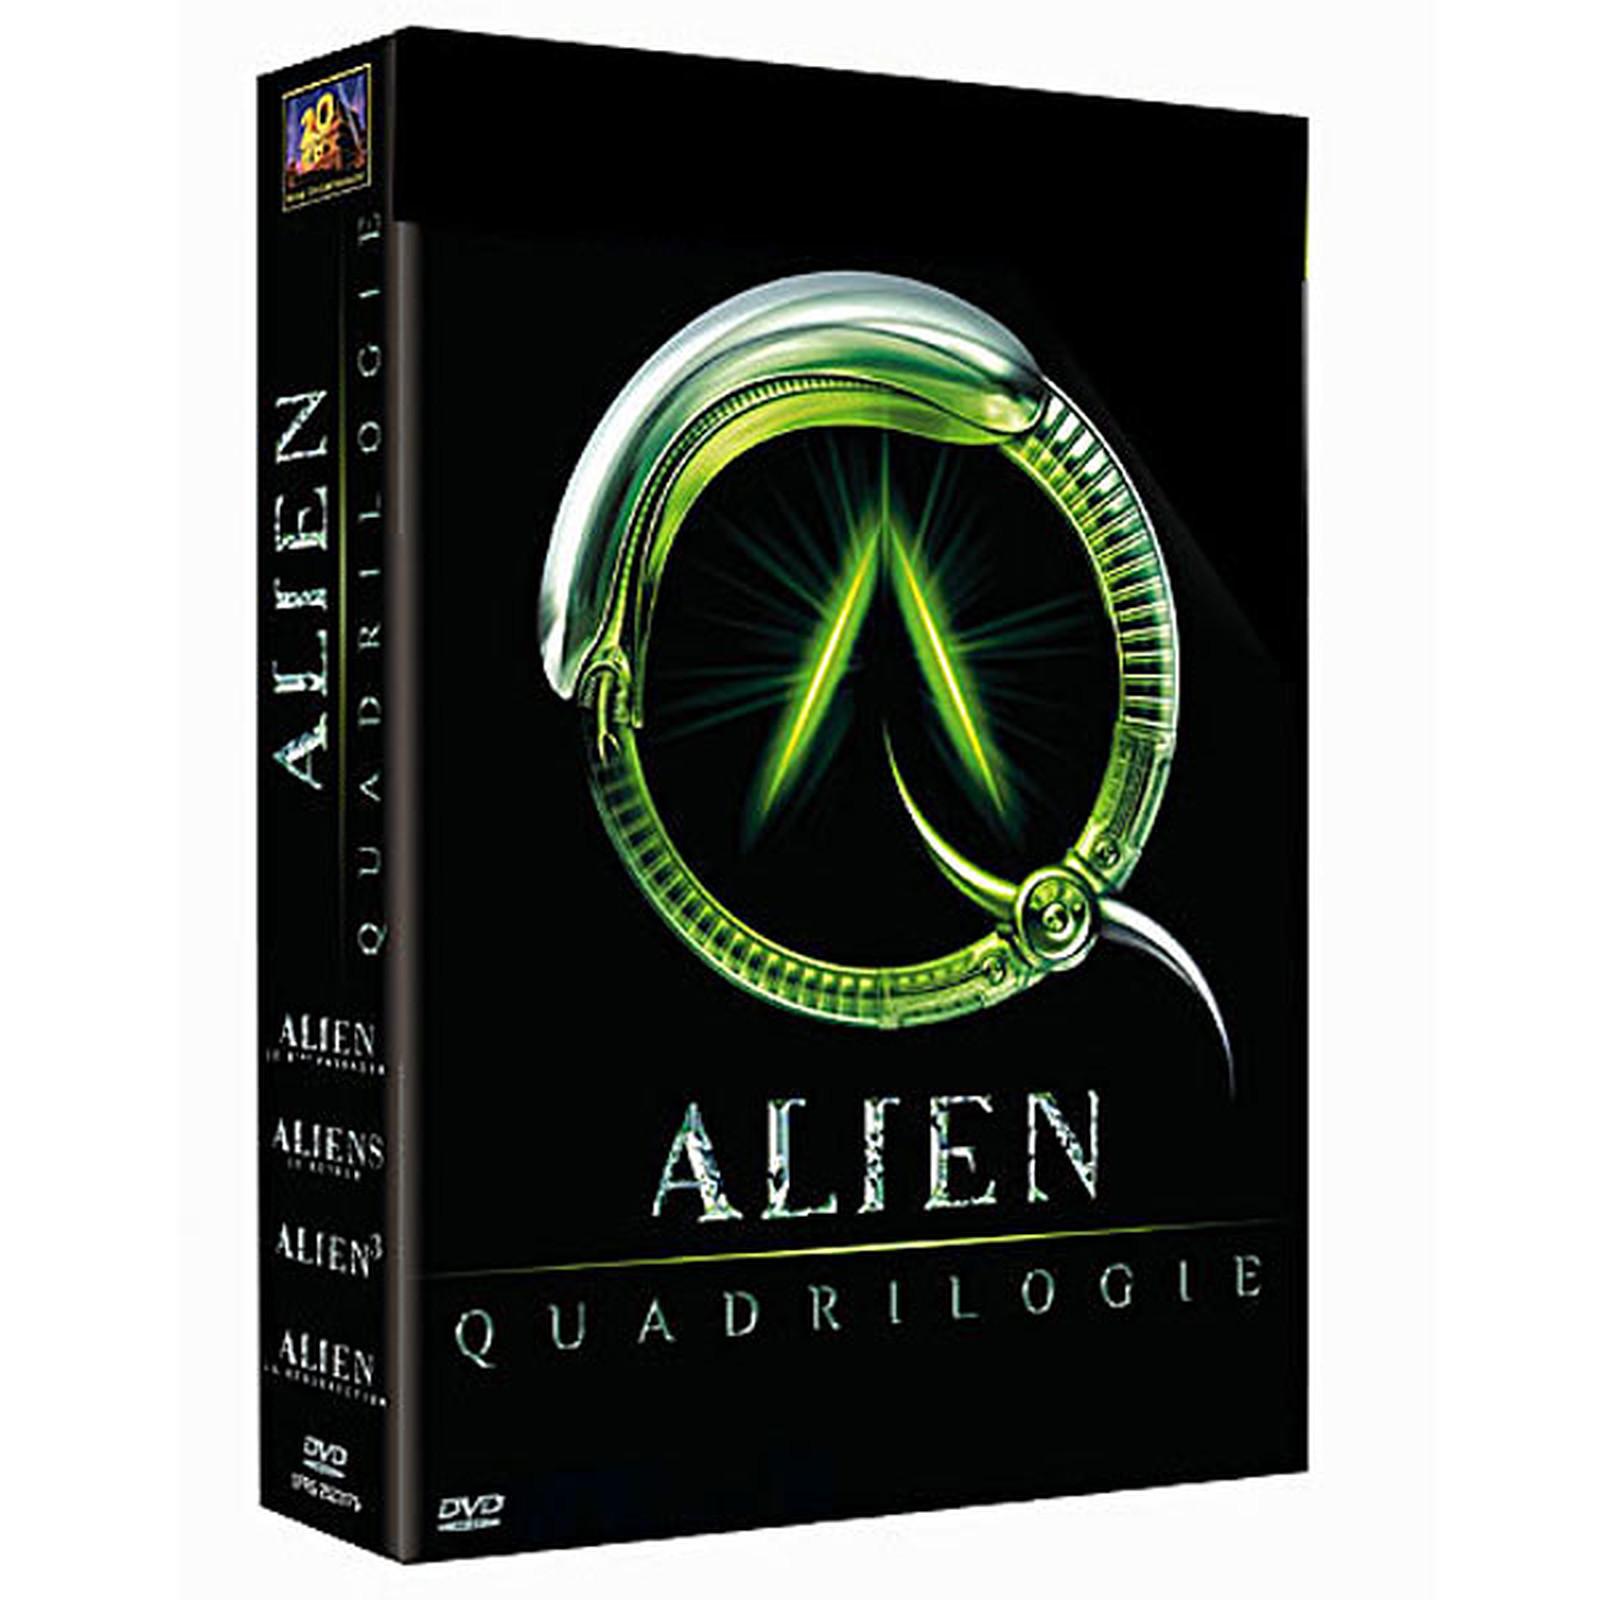 Alien - Quadrilogie (DVD)